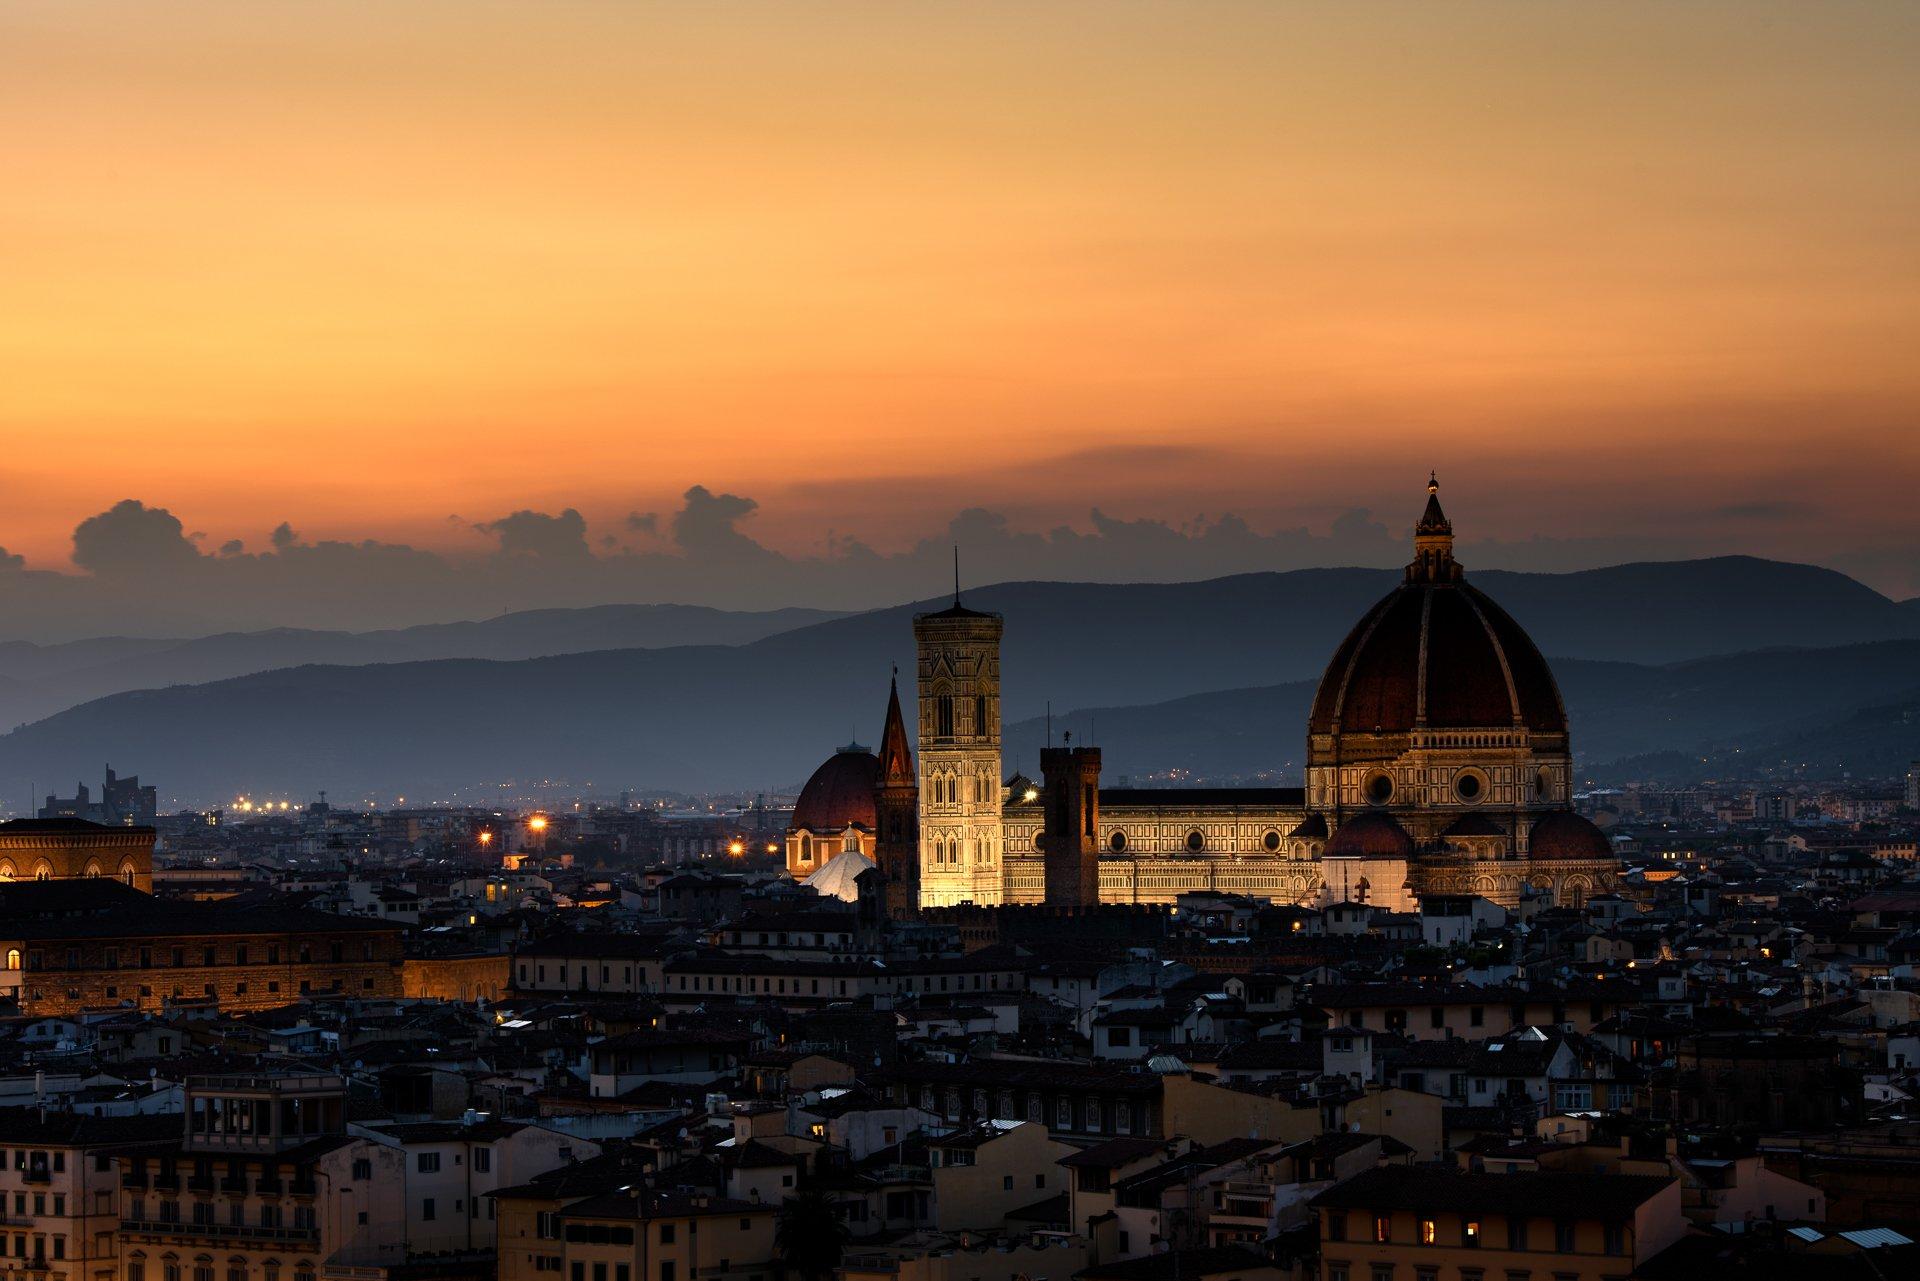 Florence, Italy, Europe, Hugo, Só, HugoSó, Nikon, D810, NikonD810, Duomo, Old, city, Sunset, Vacations, 70-200, Hugo Só